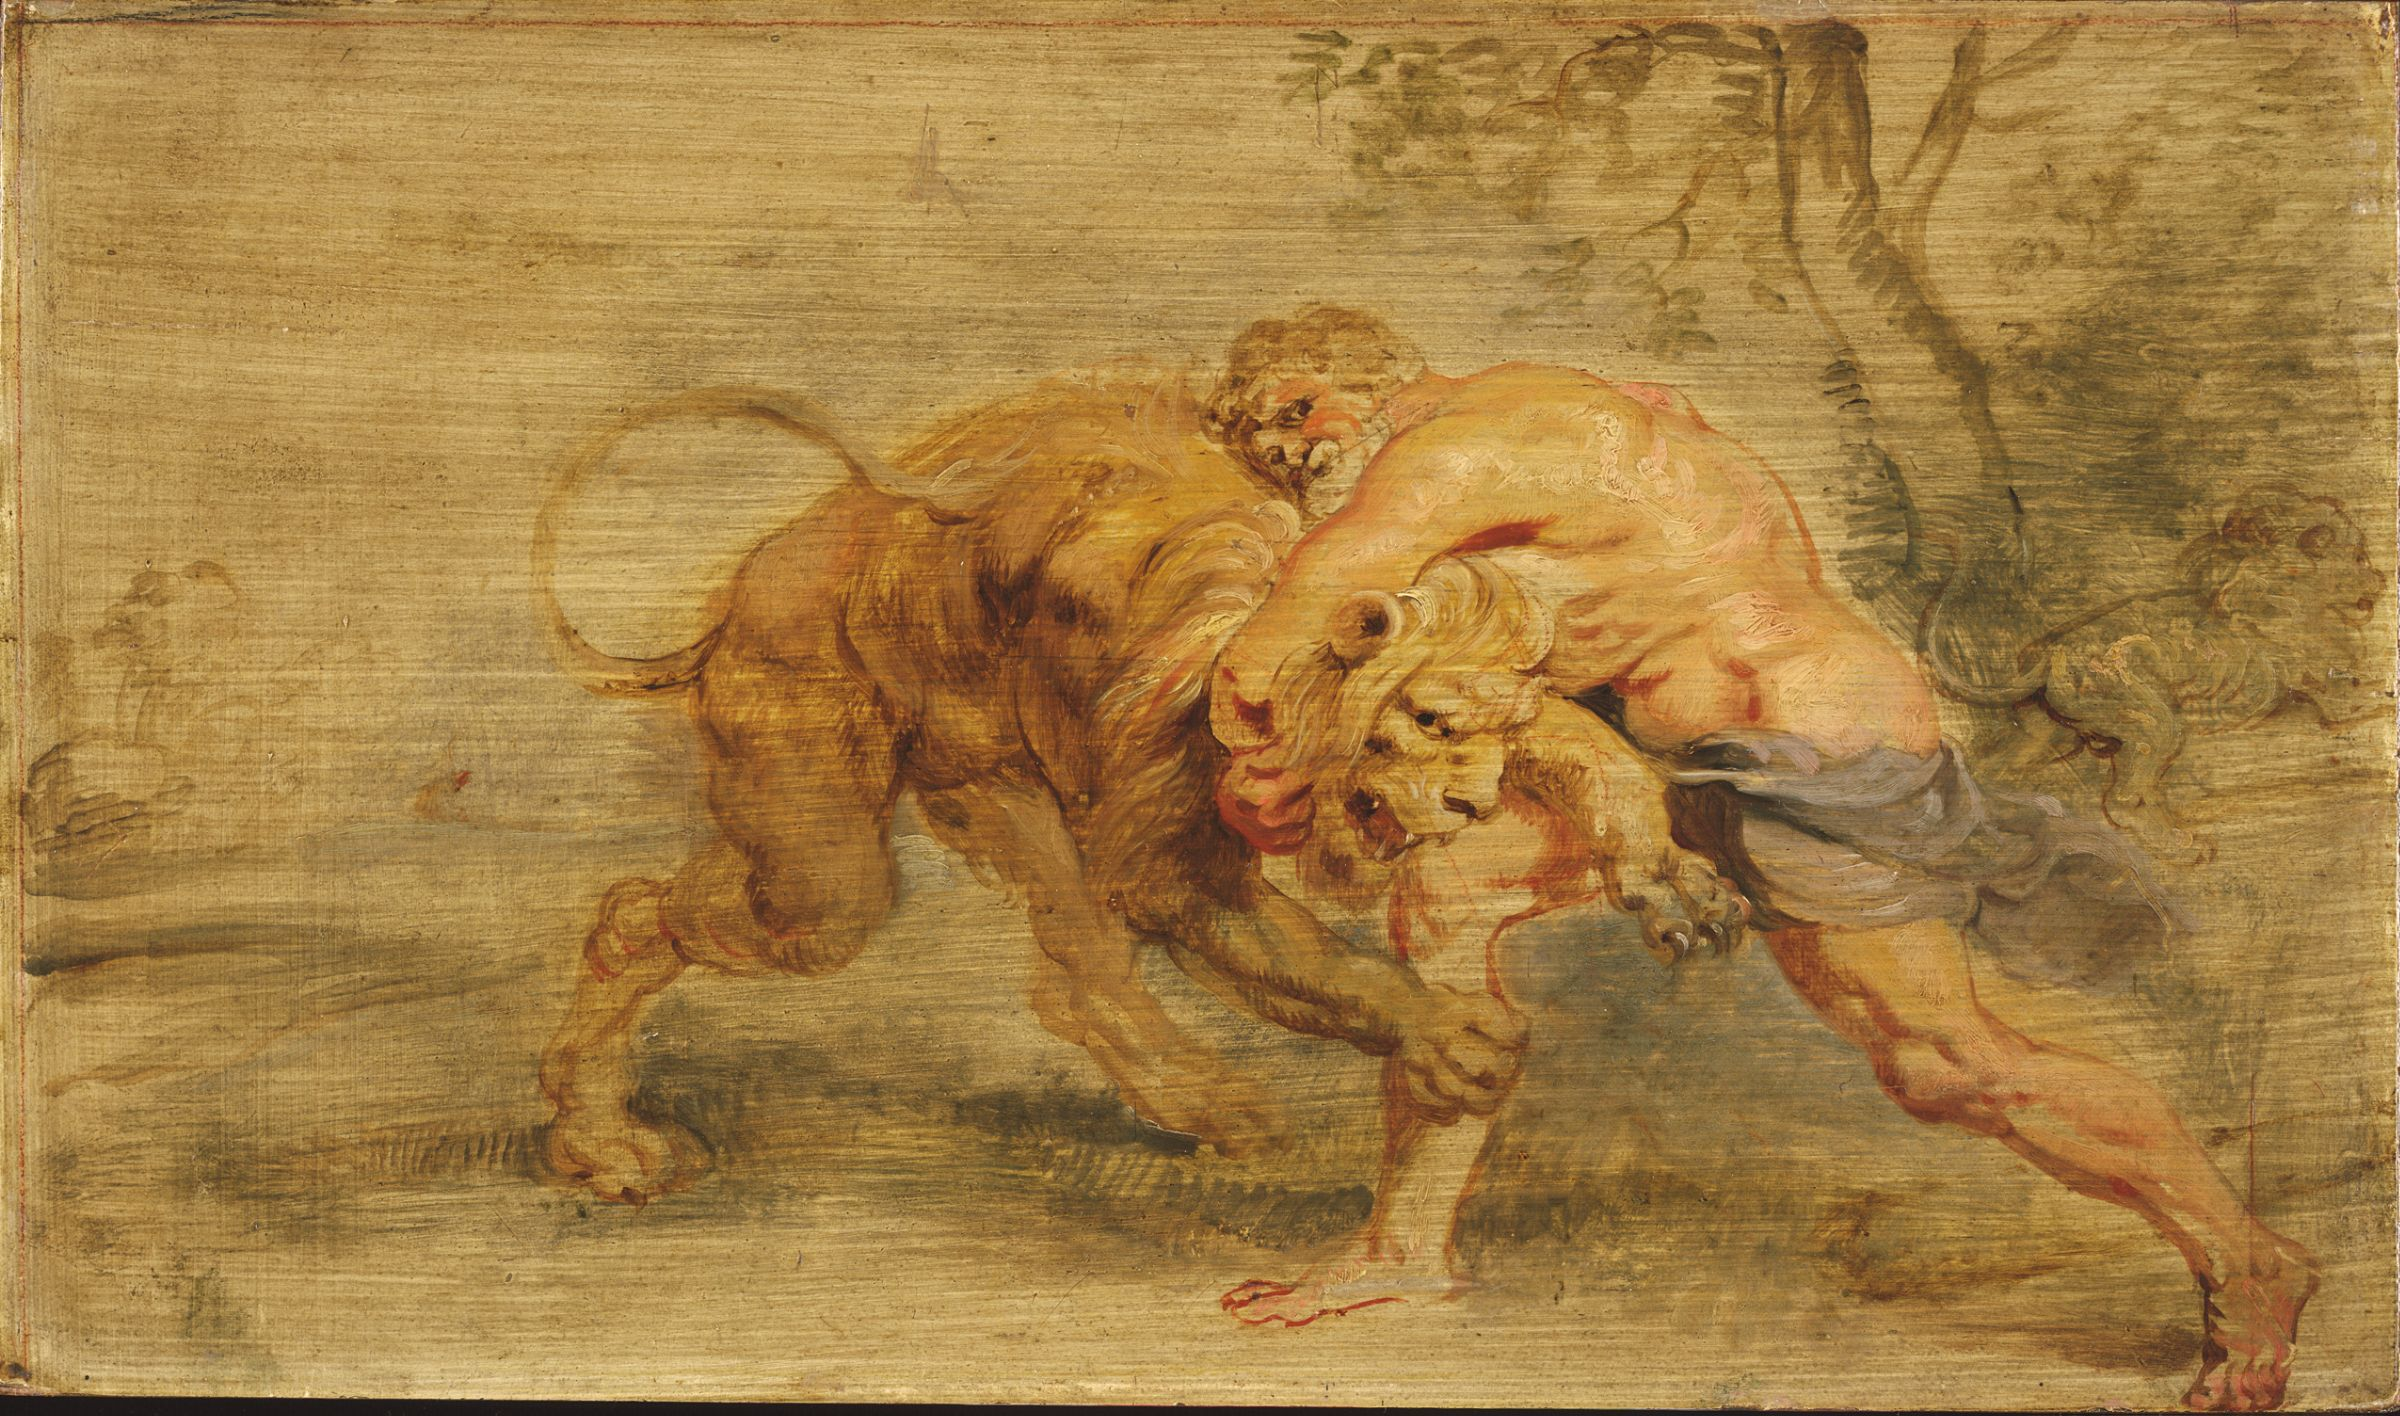 Heracles Strangling the Nemean Lion, Peter Paul Rubens, 1639